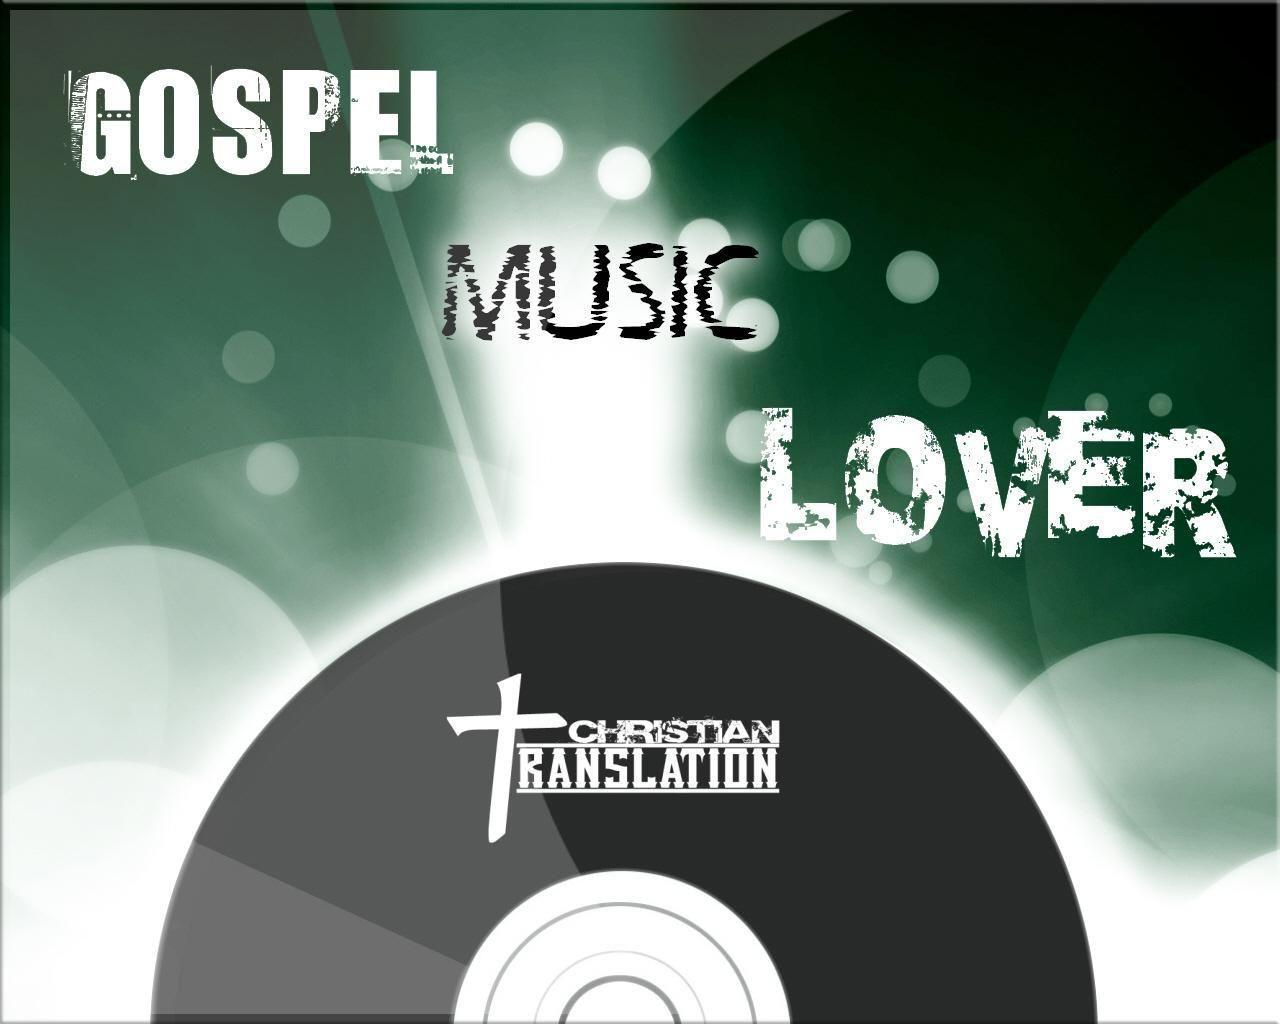 gospel music wallpaper 1280x800 - photo #2